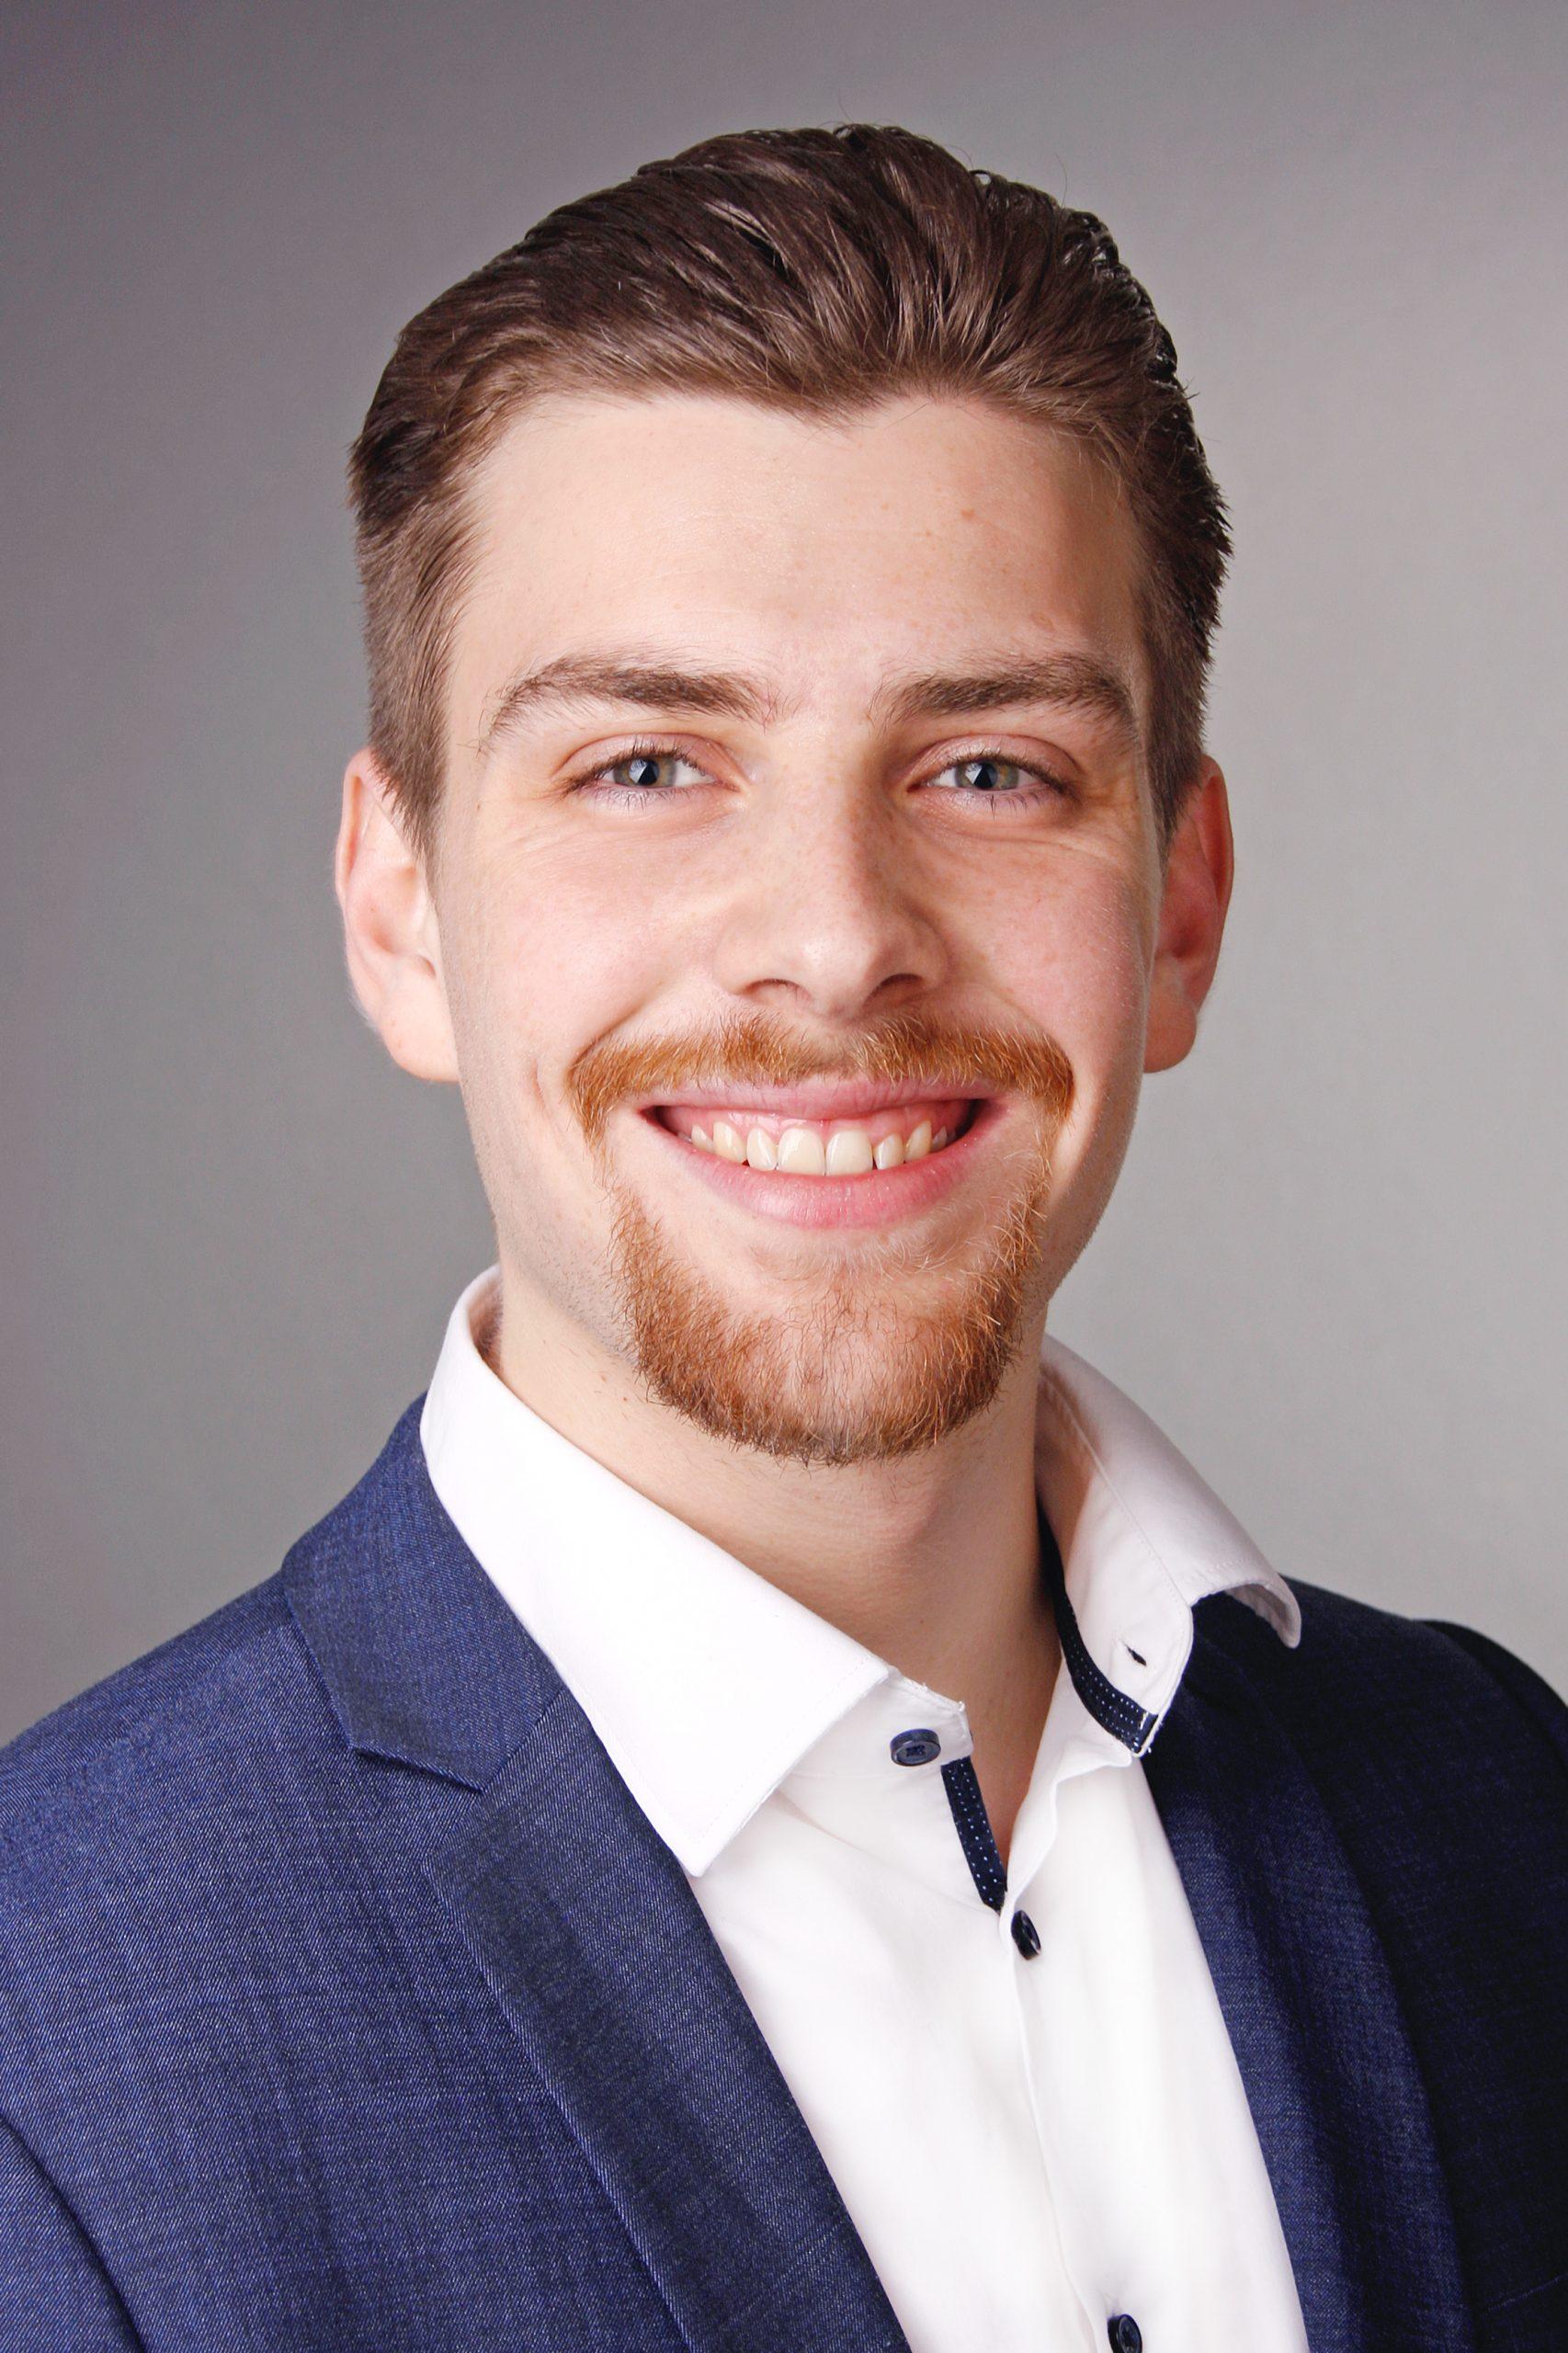 Jakob Hubloher